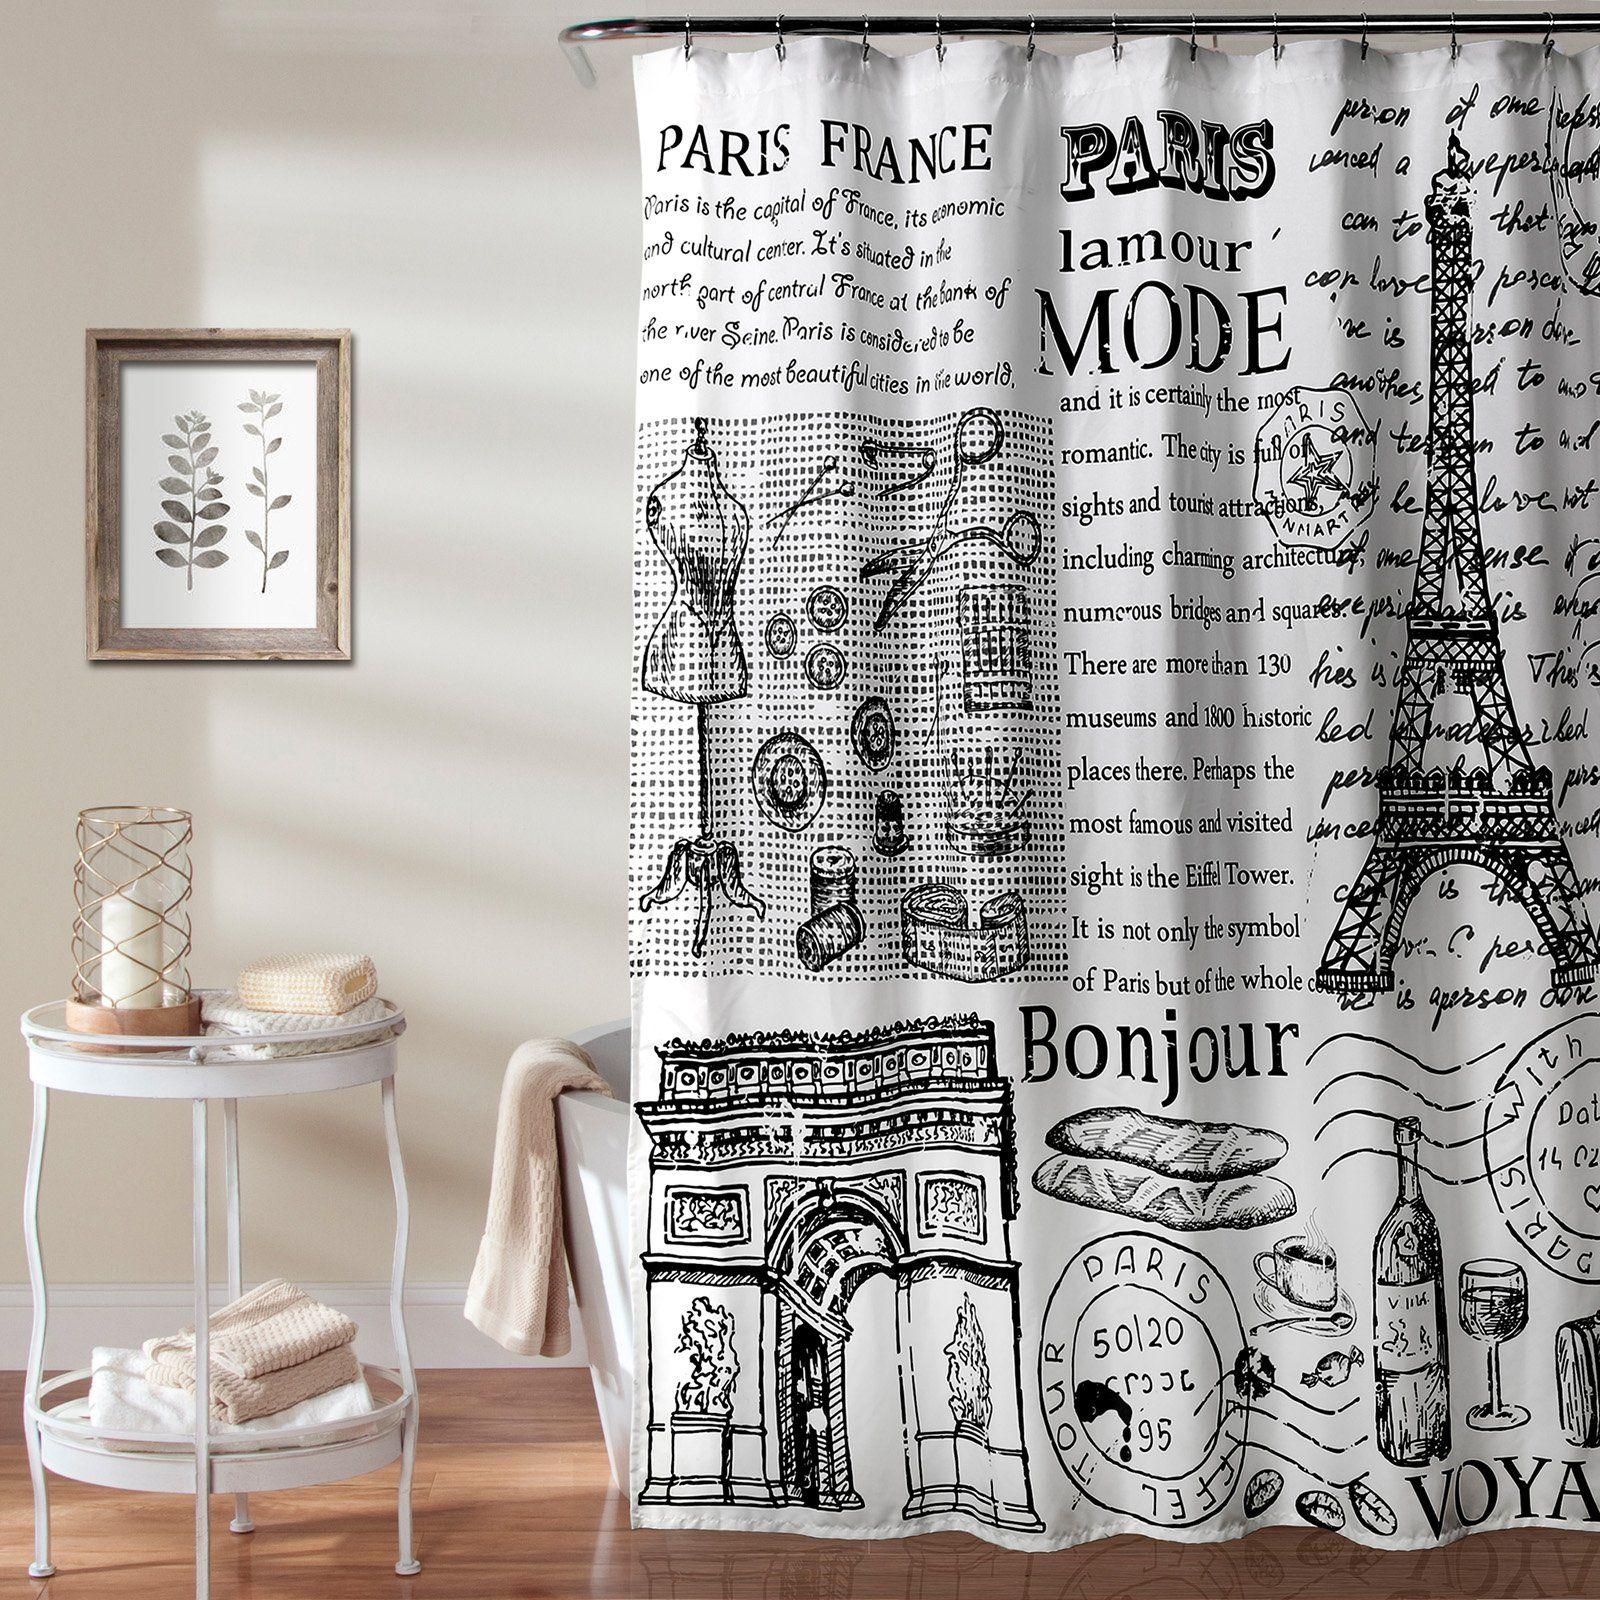 Lush Decor Paris France Fabric Shower Curtain